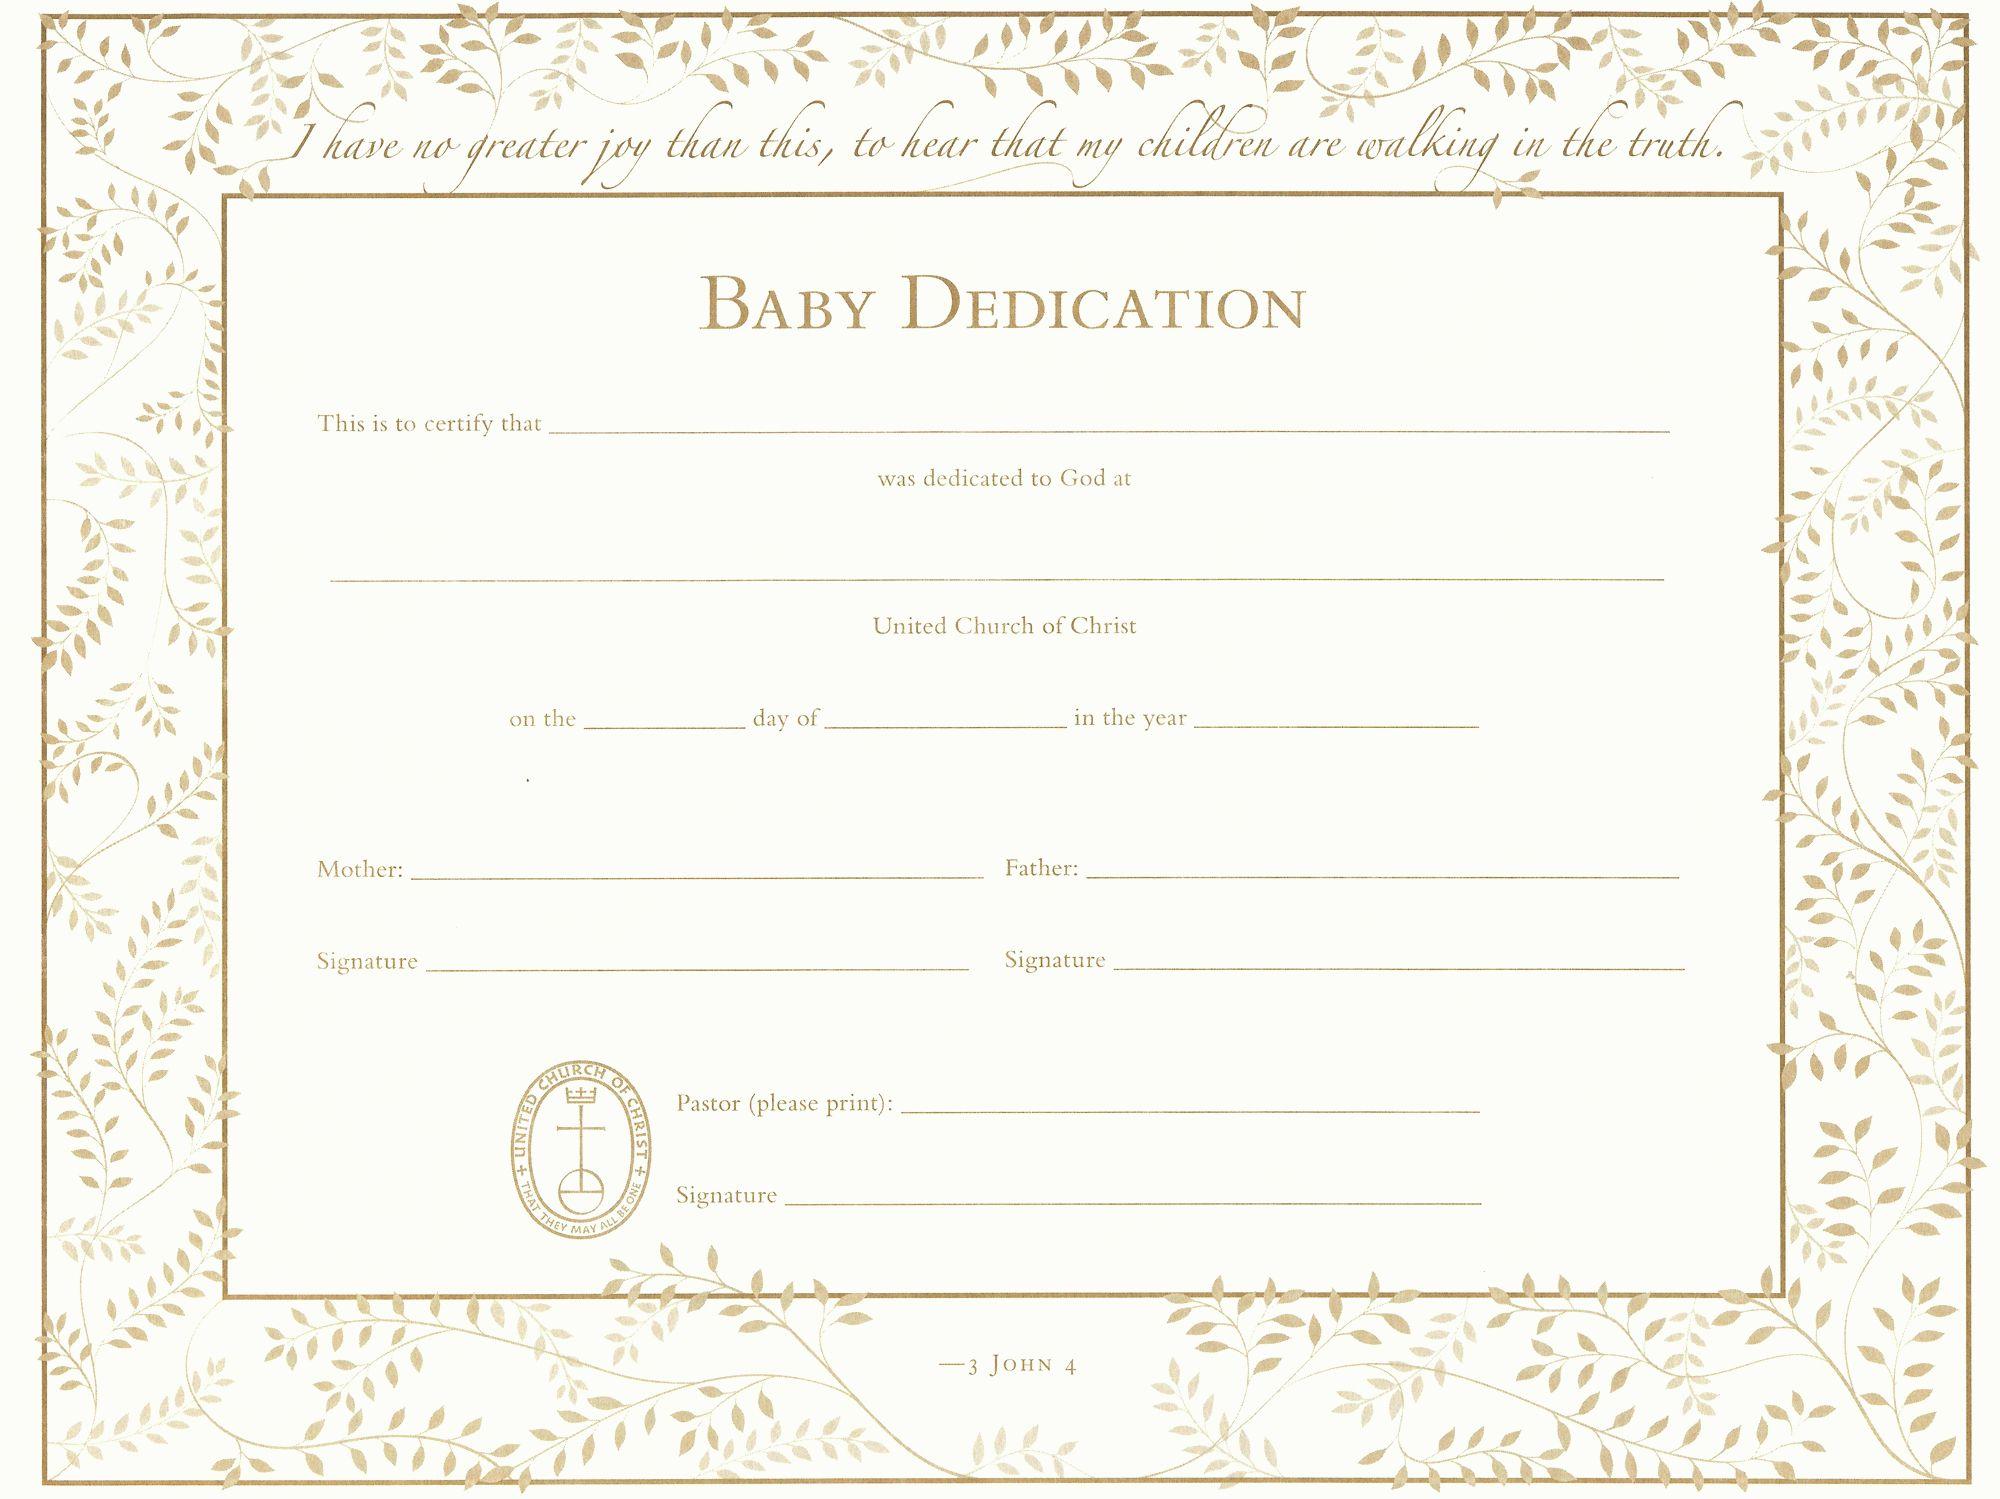 The Appealing 027 Template Ideas Baby Dedication Certificate Wonderful Inside Baby Dedication Baby Dedication Certificate Baby Dedication Certificate Templates Baby dedication certificate templates free